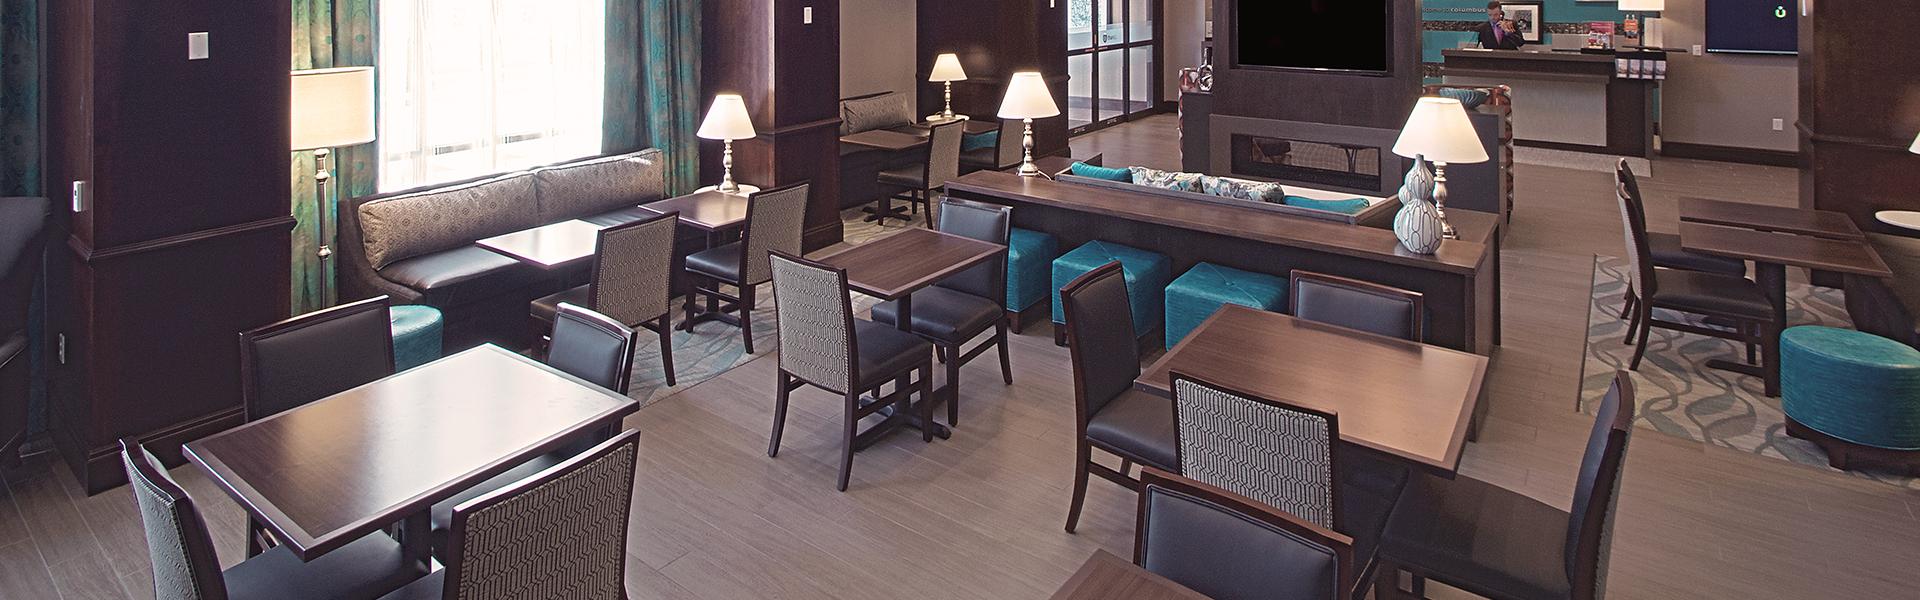 Indus Hotels